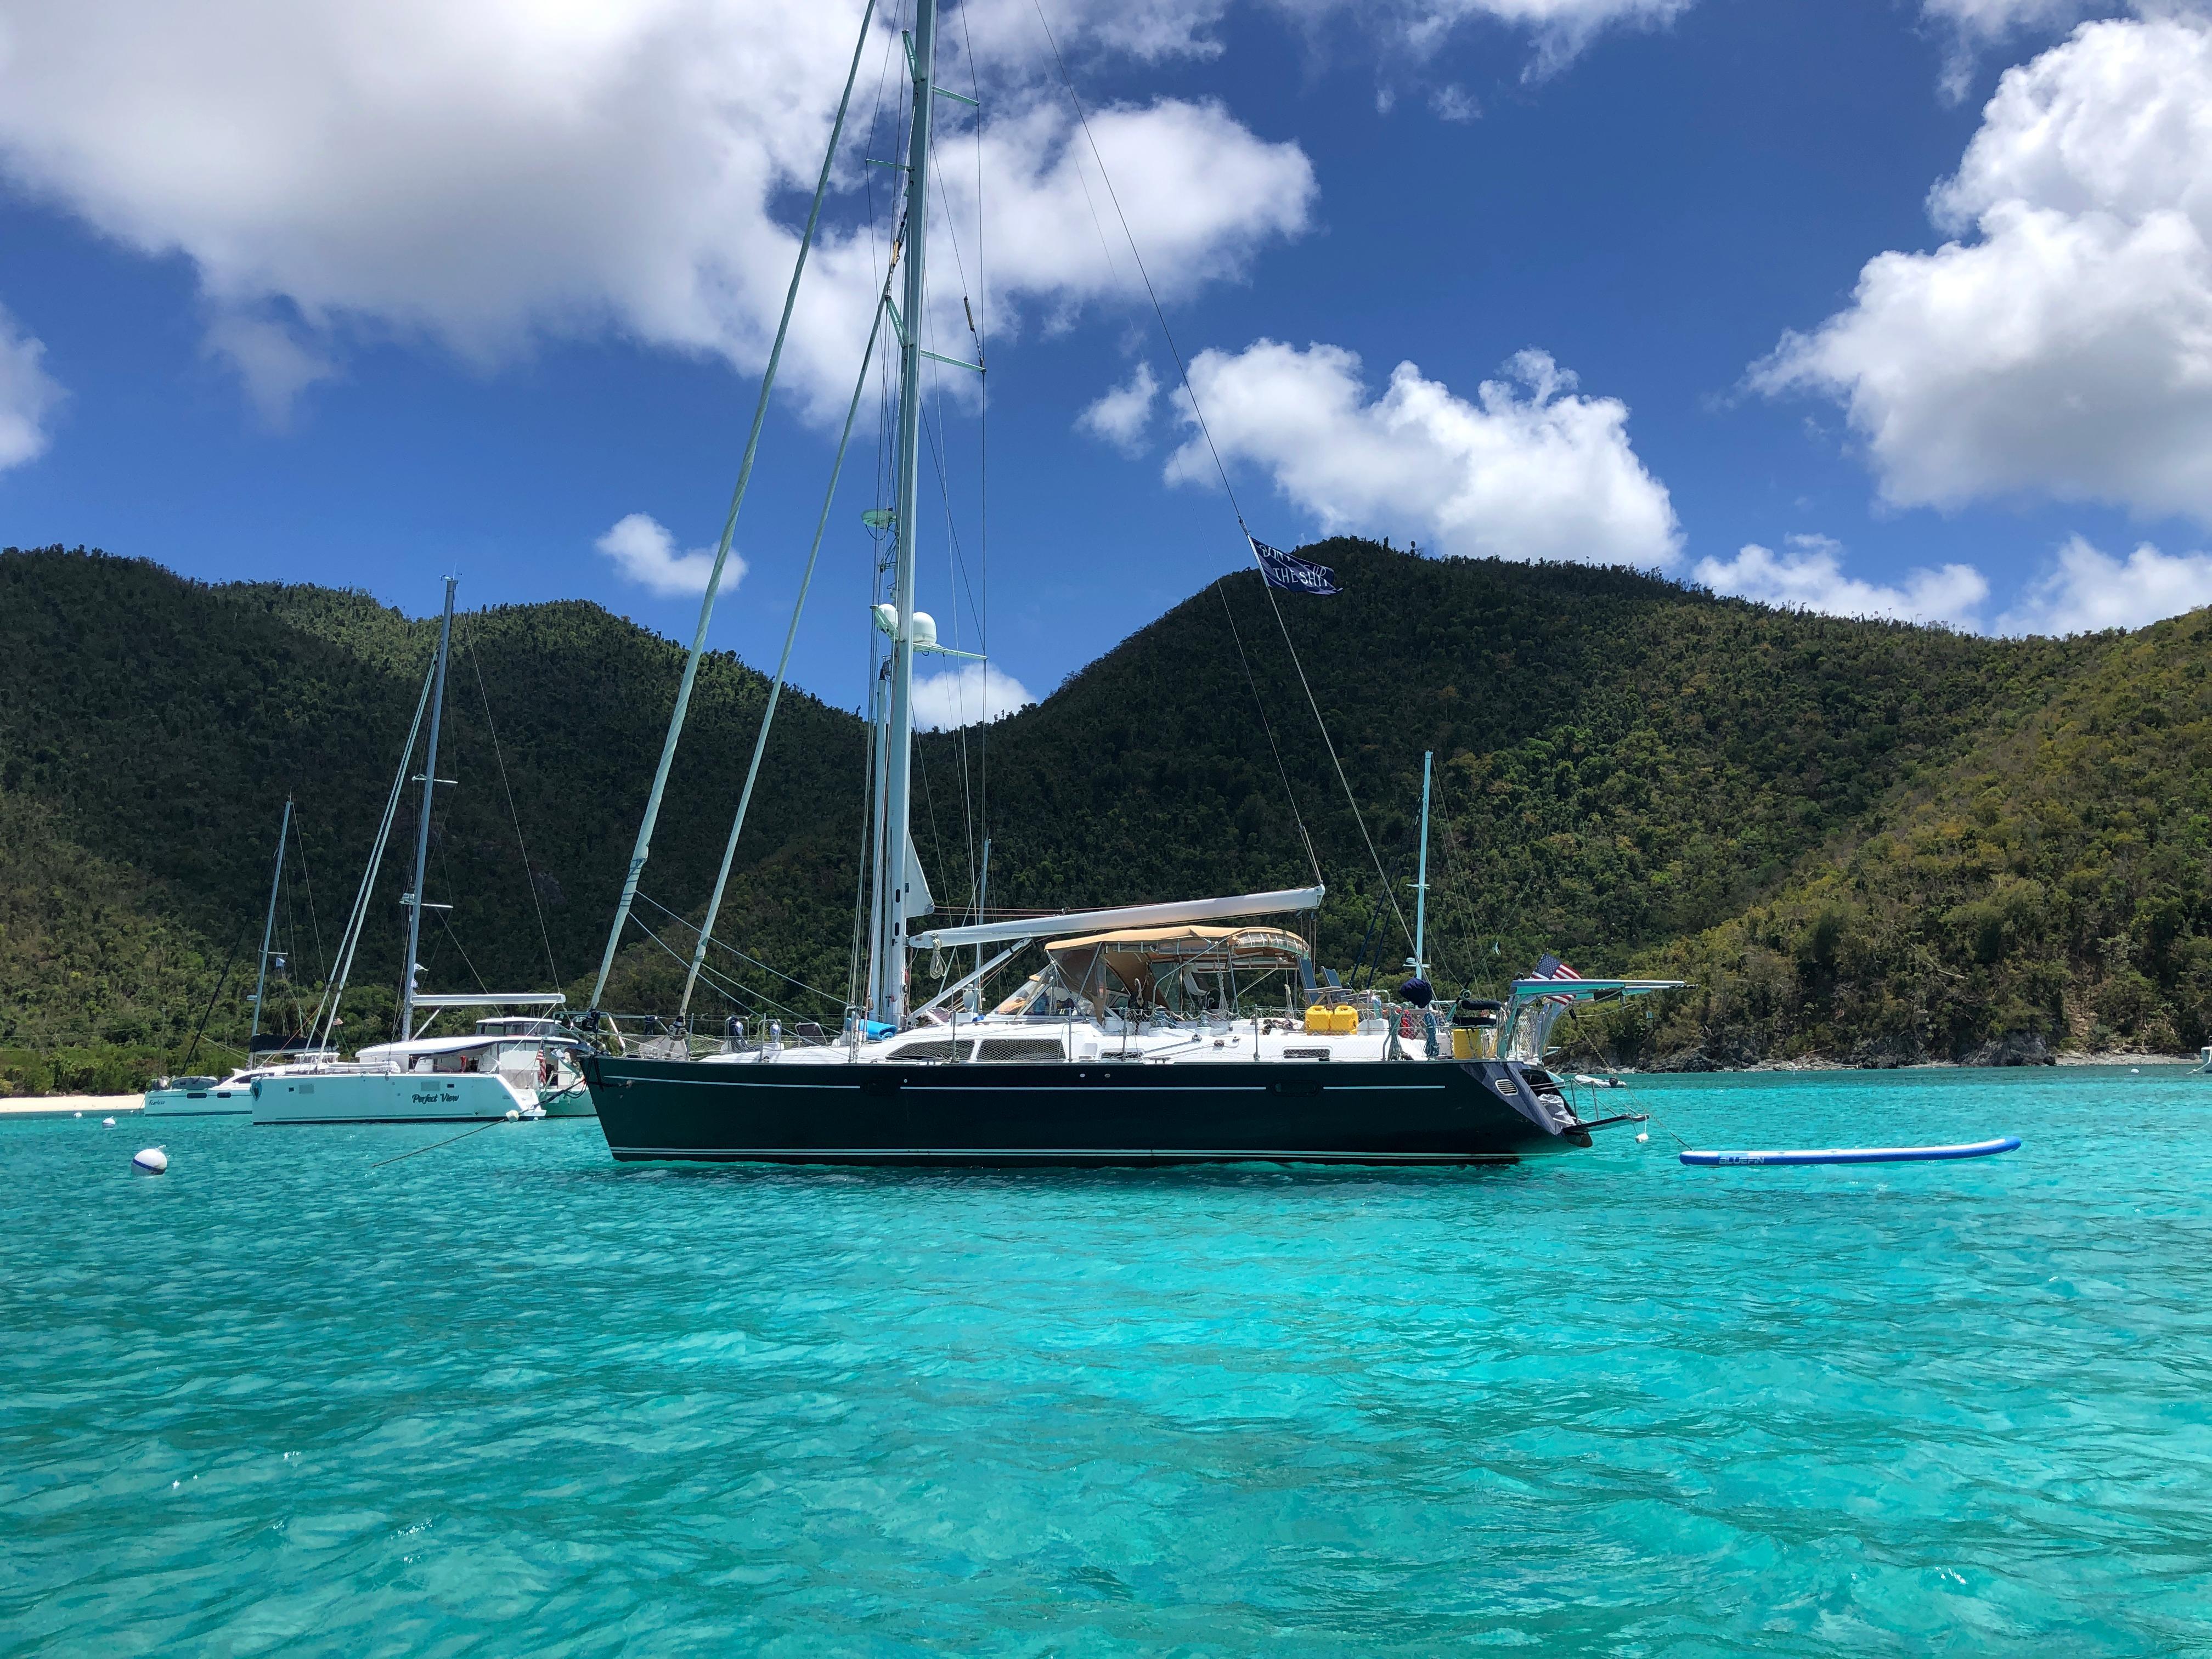 Karma in the Caribbean